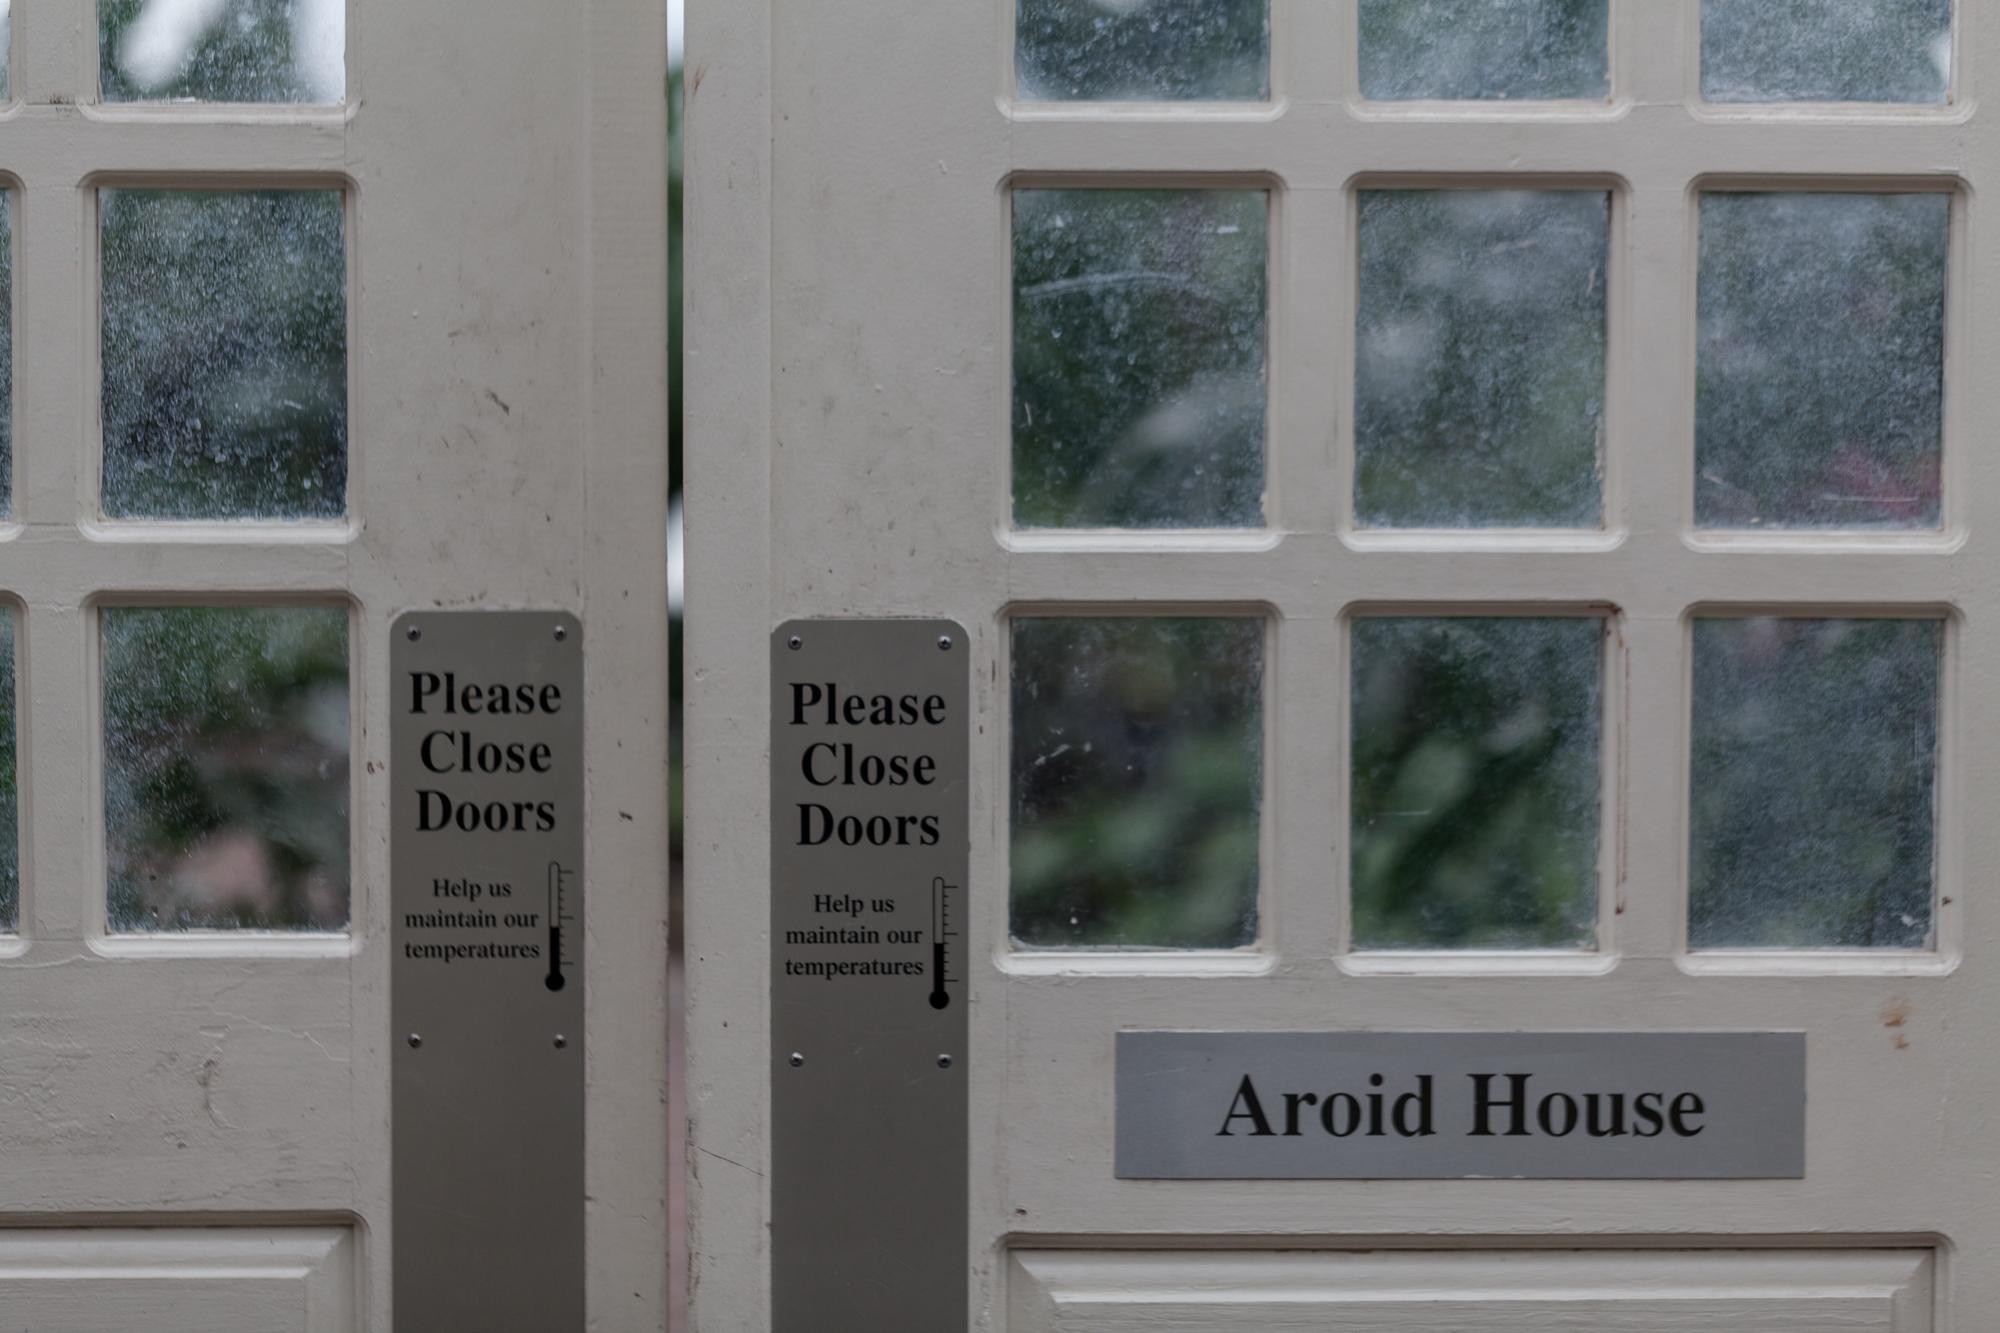 Aroid-House-Garfield-Park-Conservatory.jpg